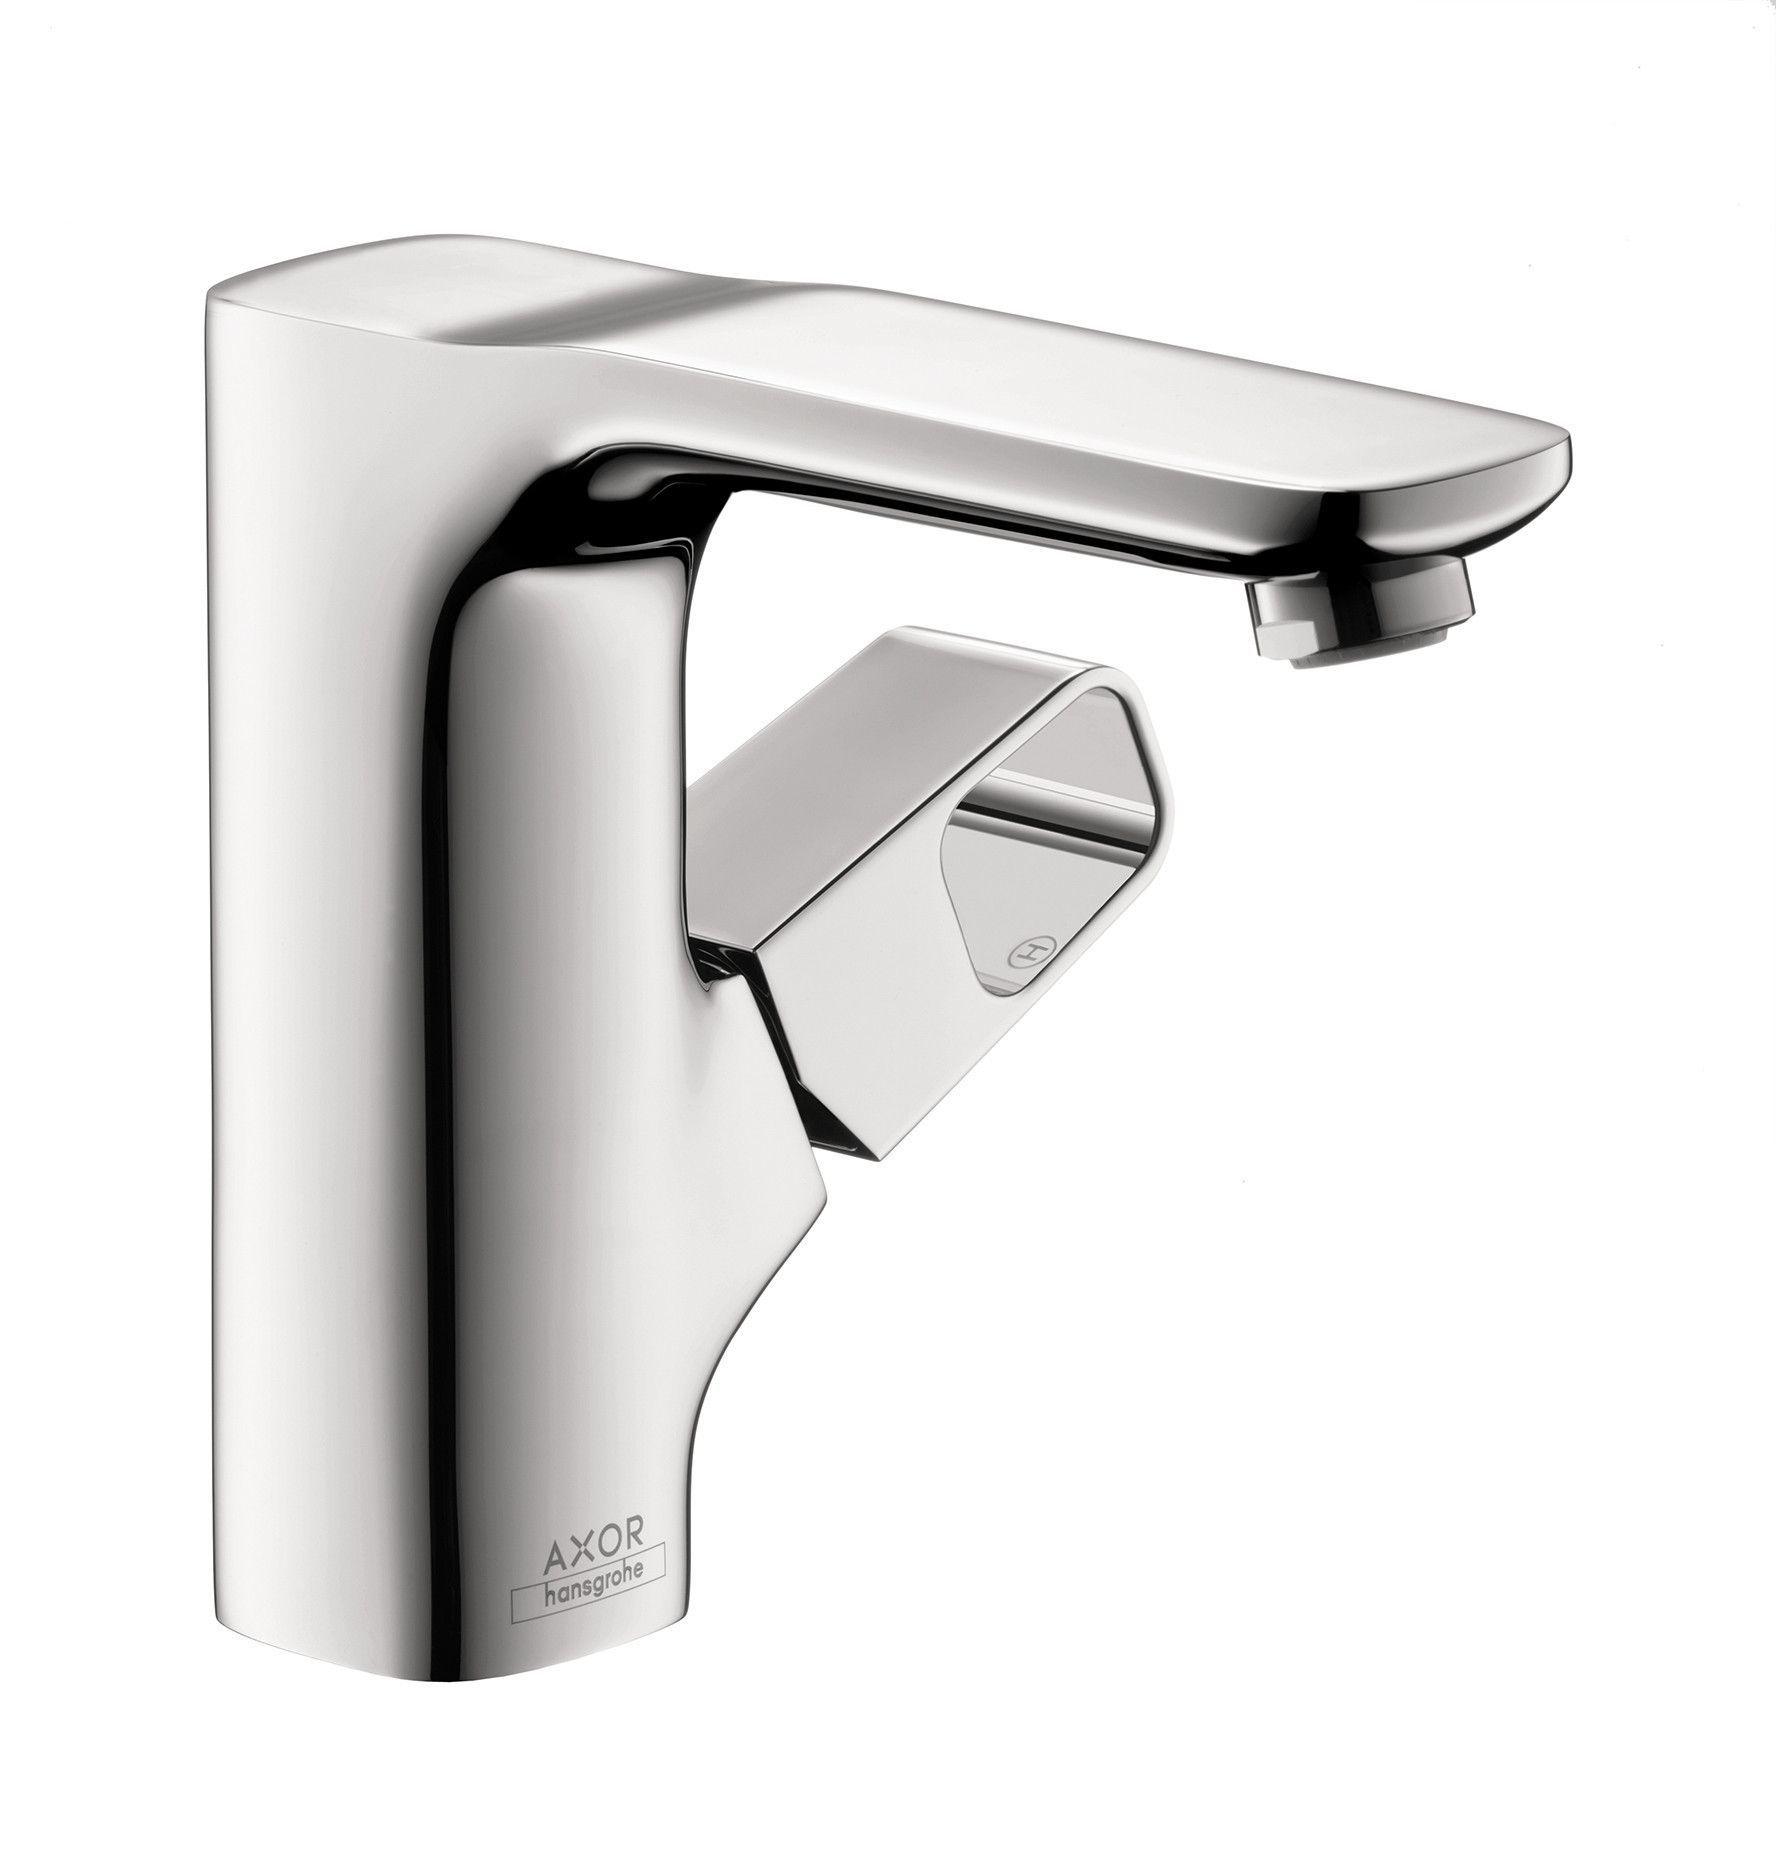 Hansgrohe 11020001 Chrome Axor Urquiola Bathroom Faucet Single ...